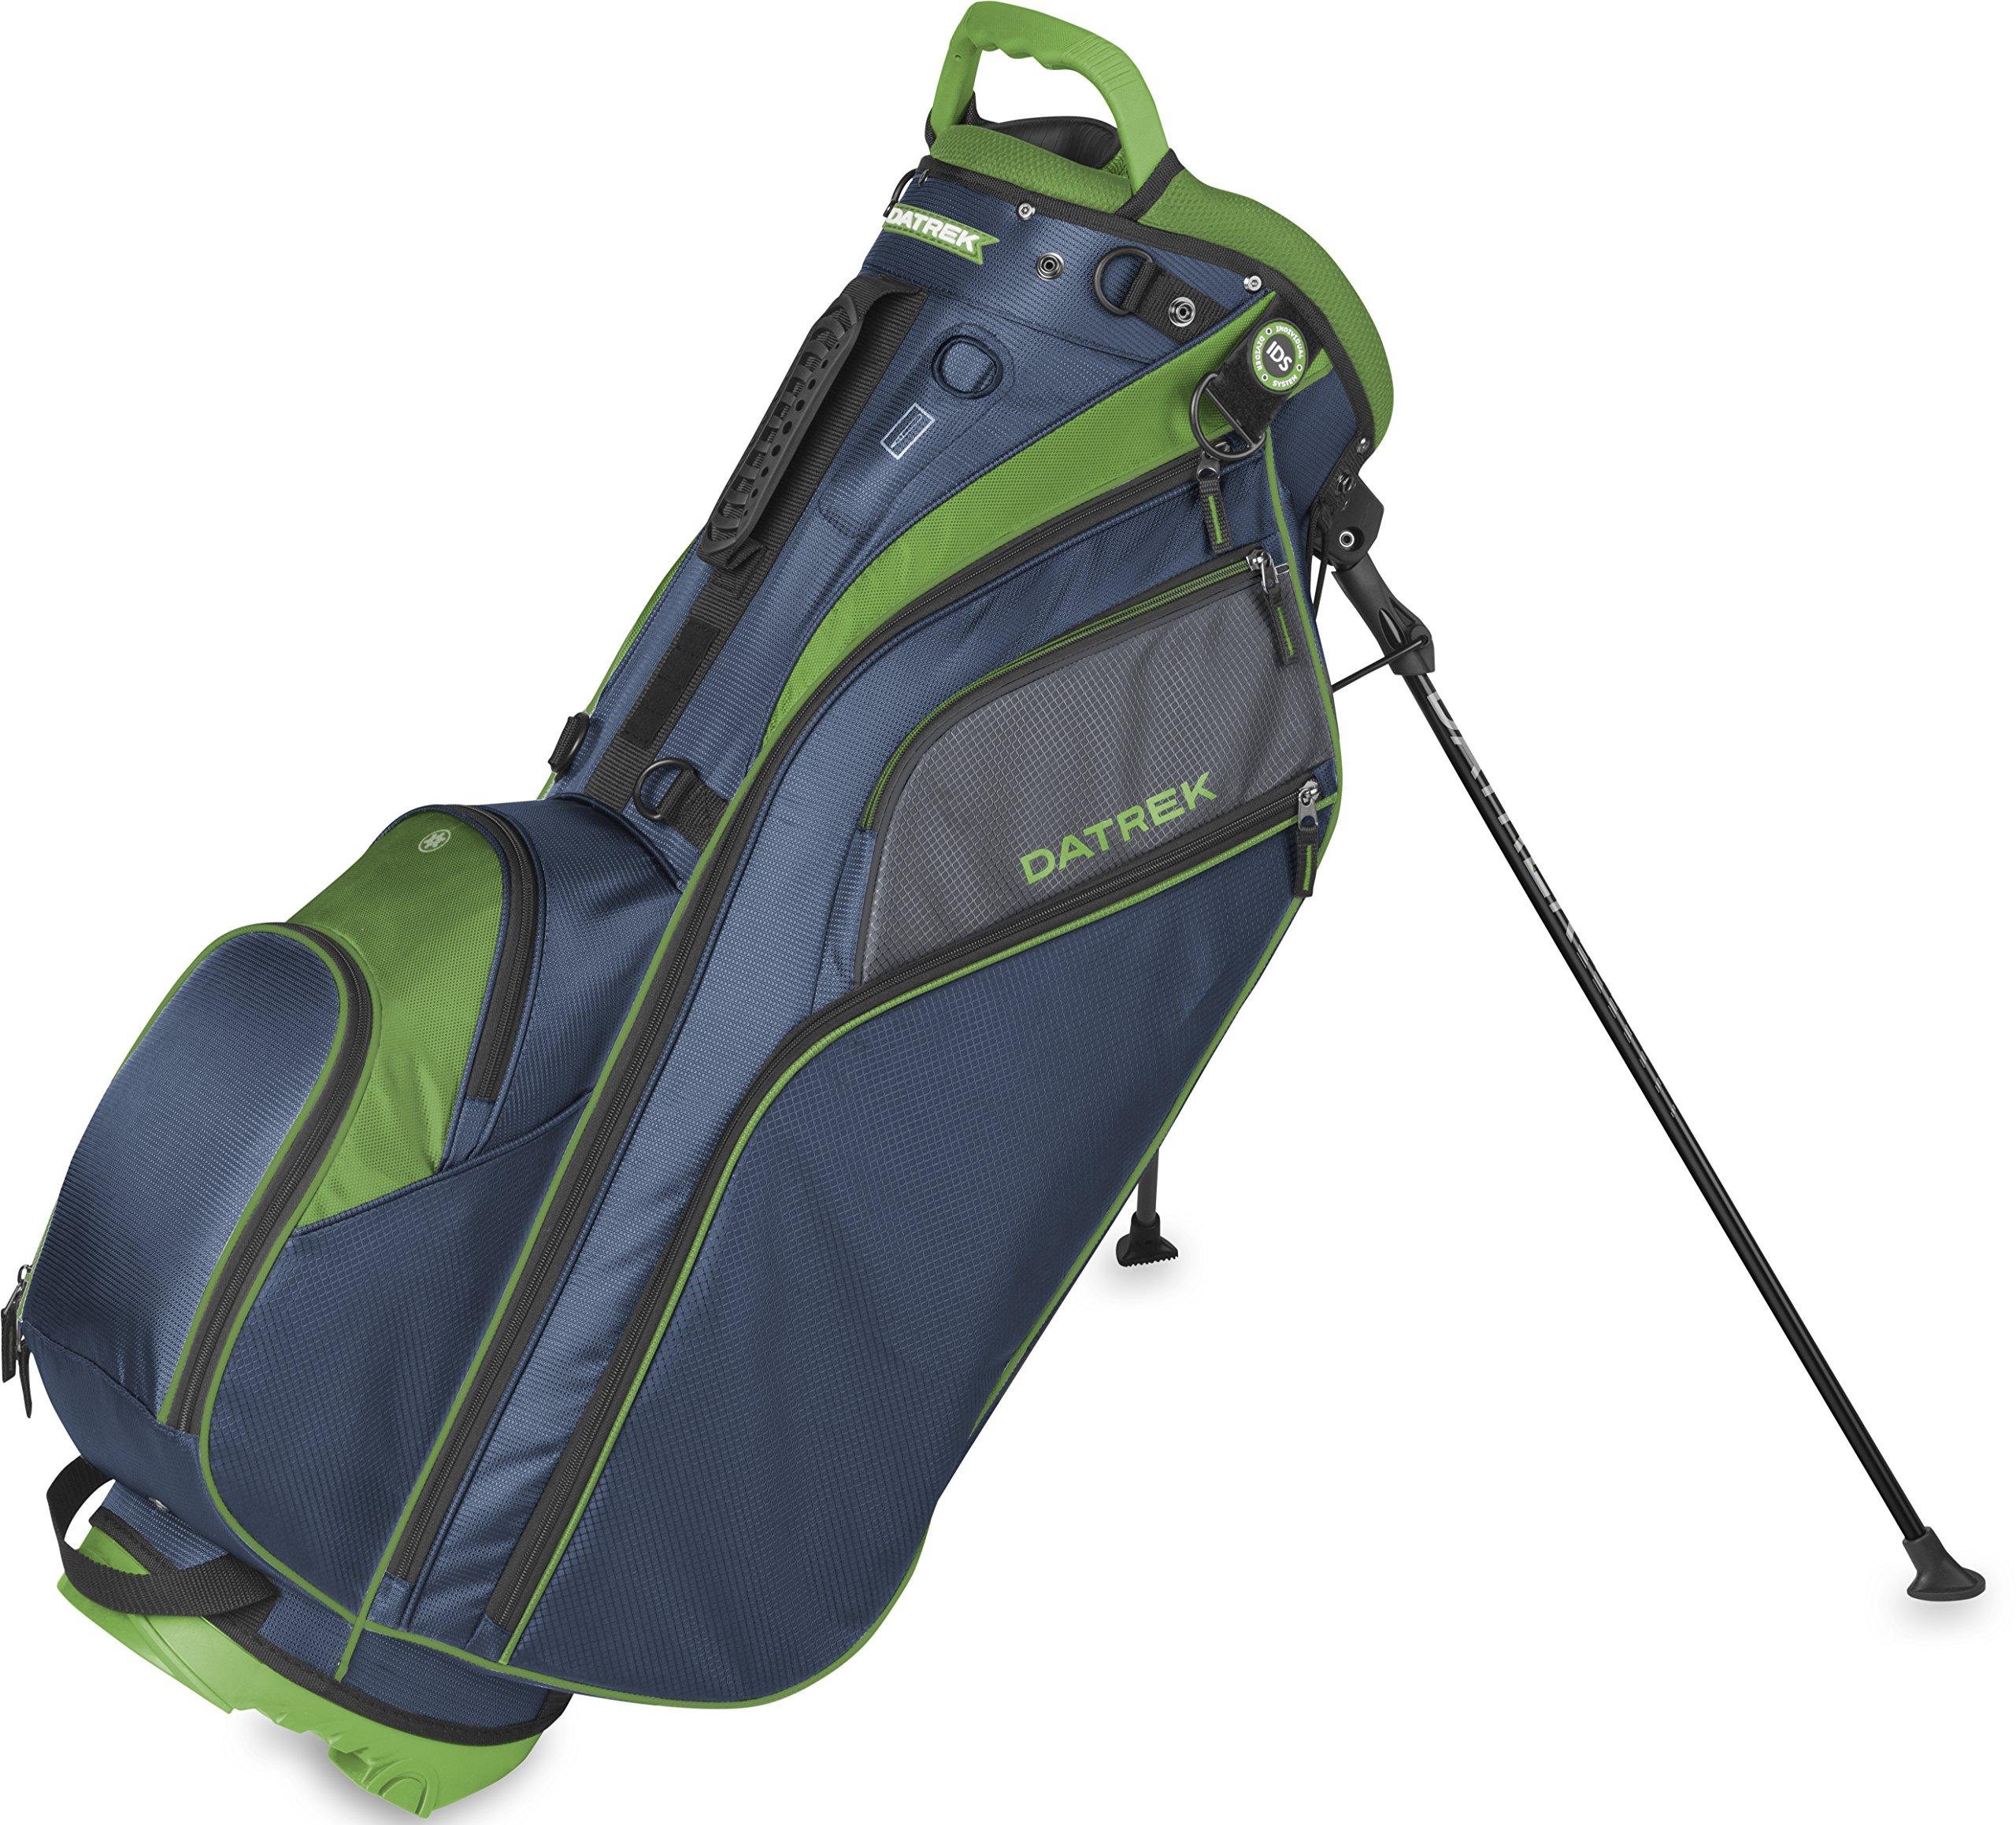 Datrek Golf Go Lite Hybrid Stand Bag (Navy/Slate/Lime) by Datrek